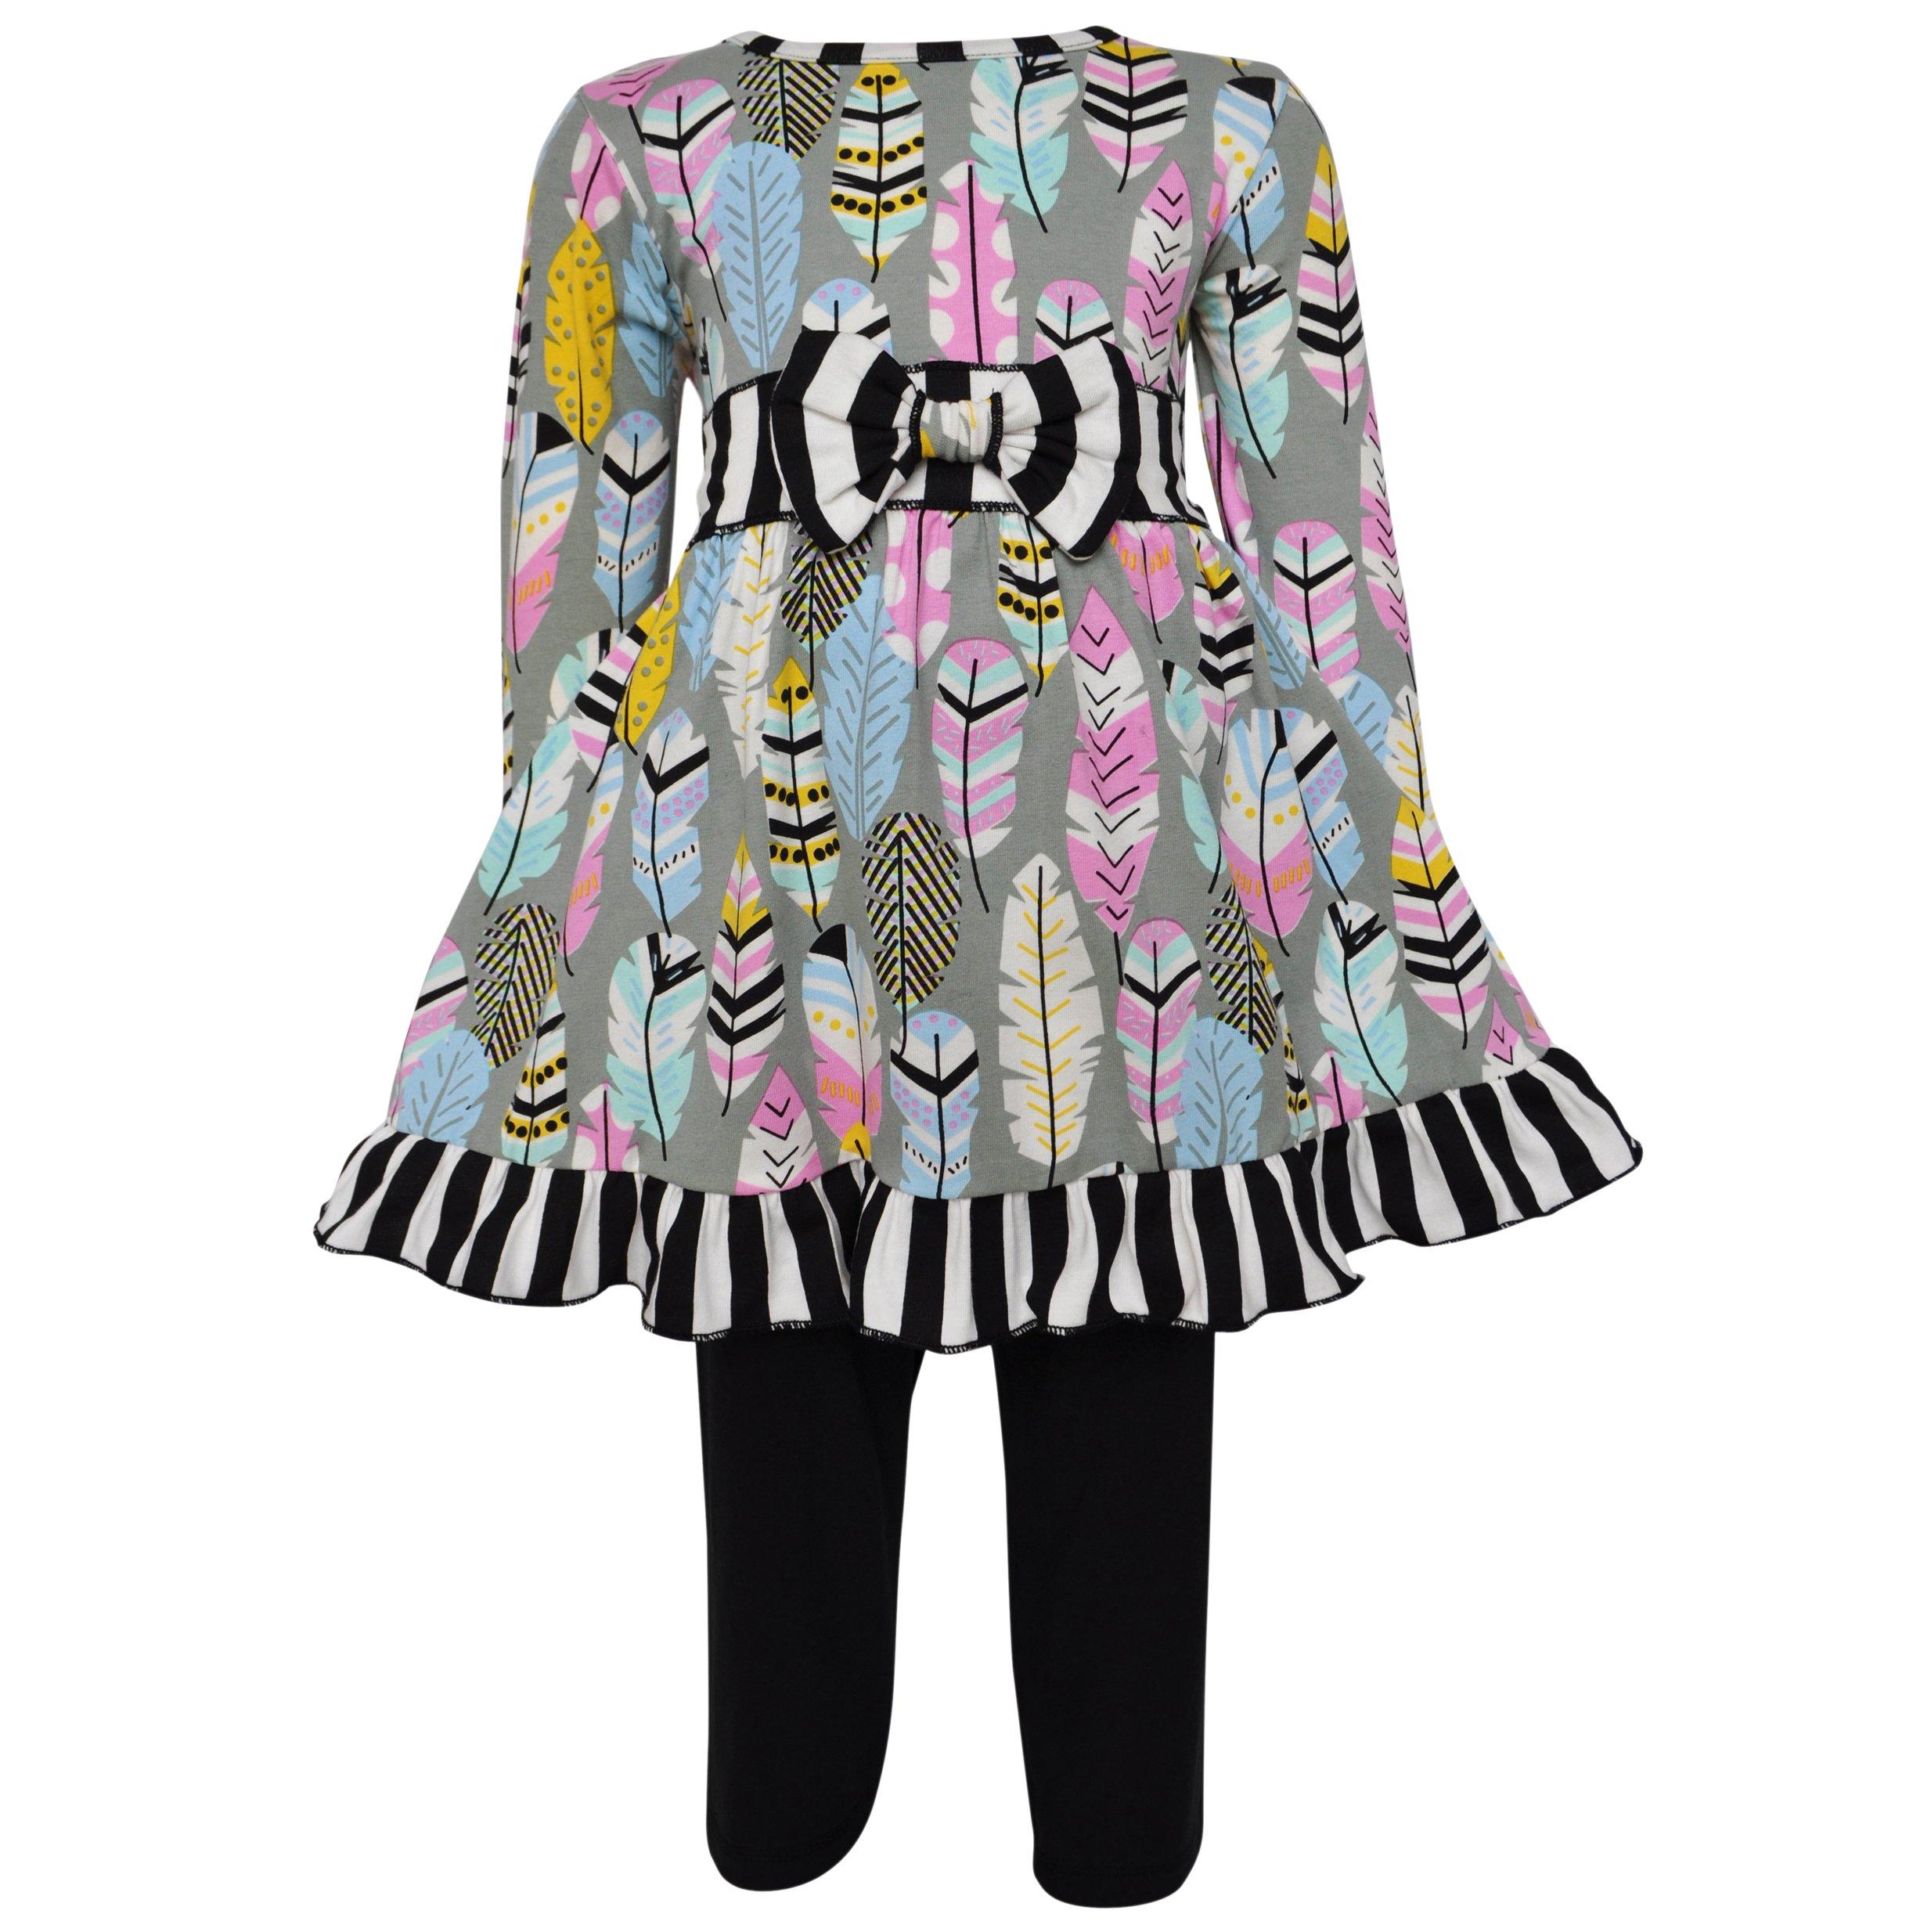 AnnLoren Big Girls 11/12 Boutique Fabulous Feathers Dress & Leggings Outfit Set